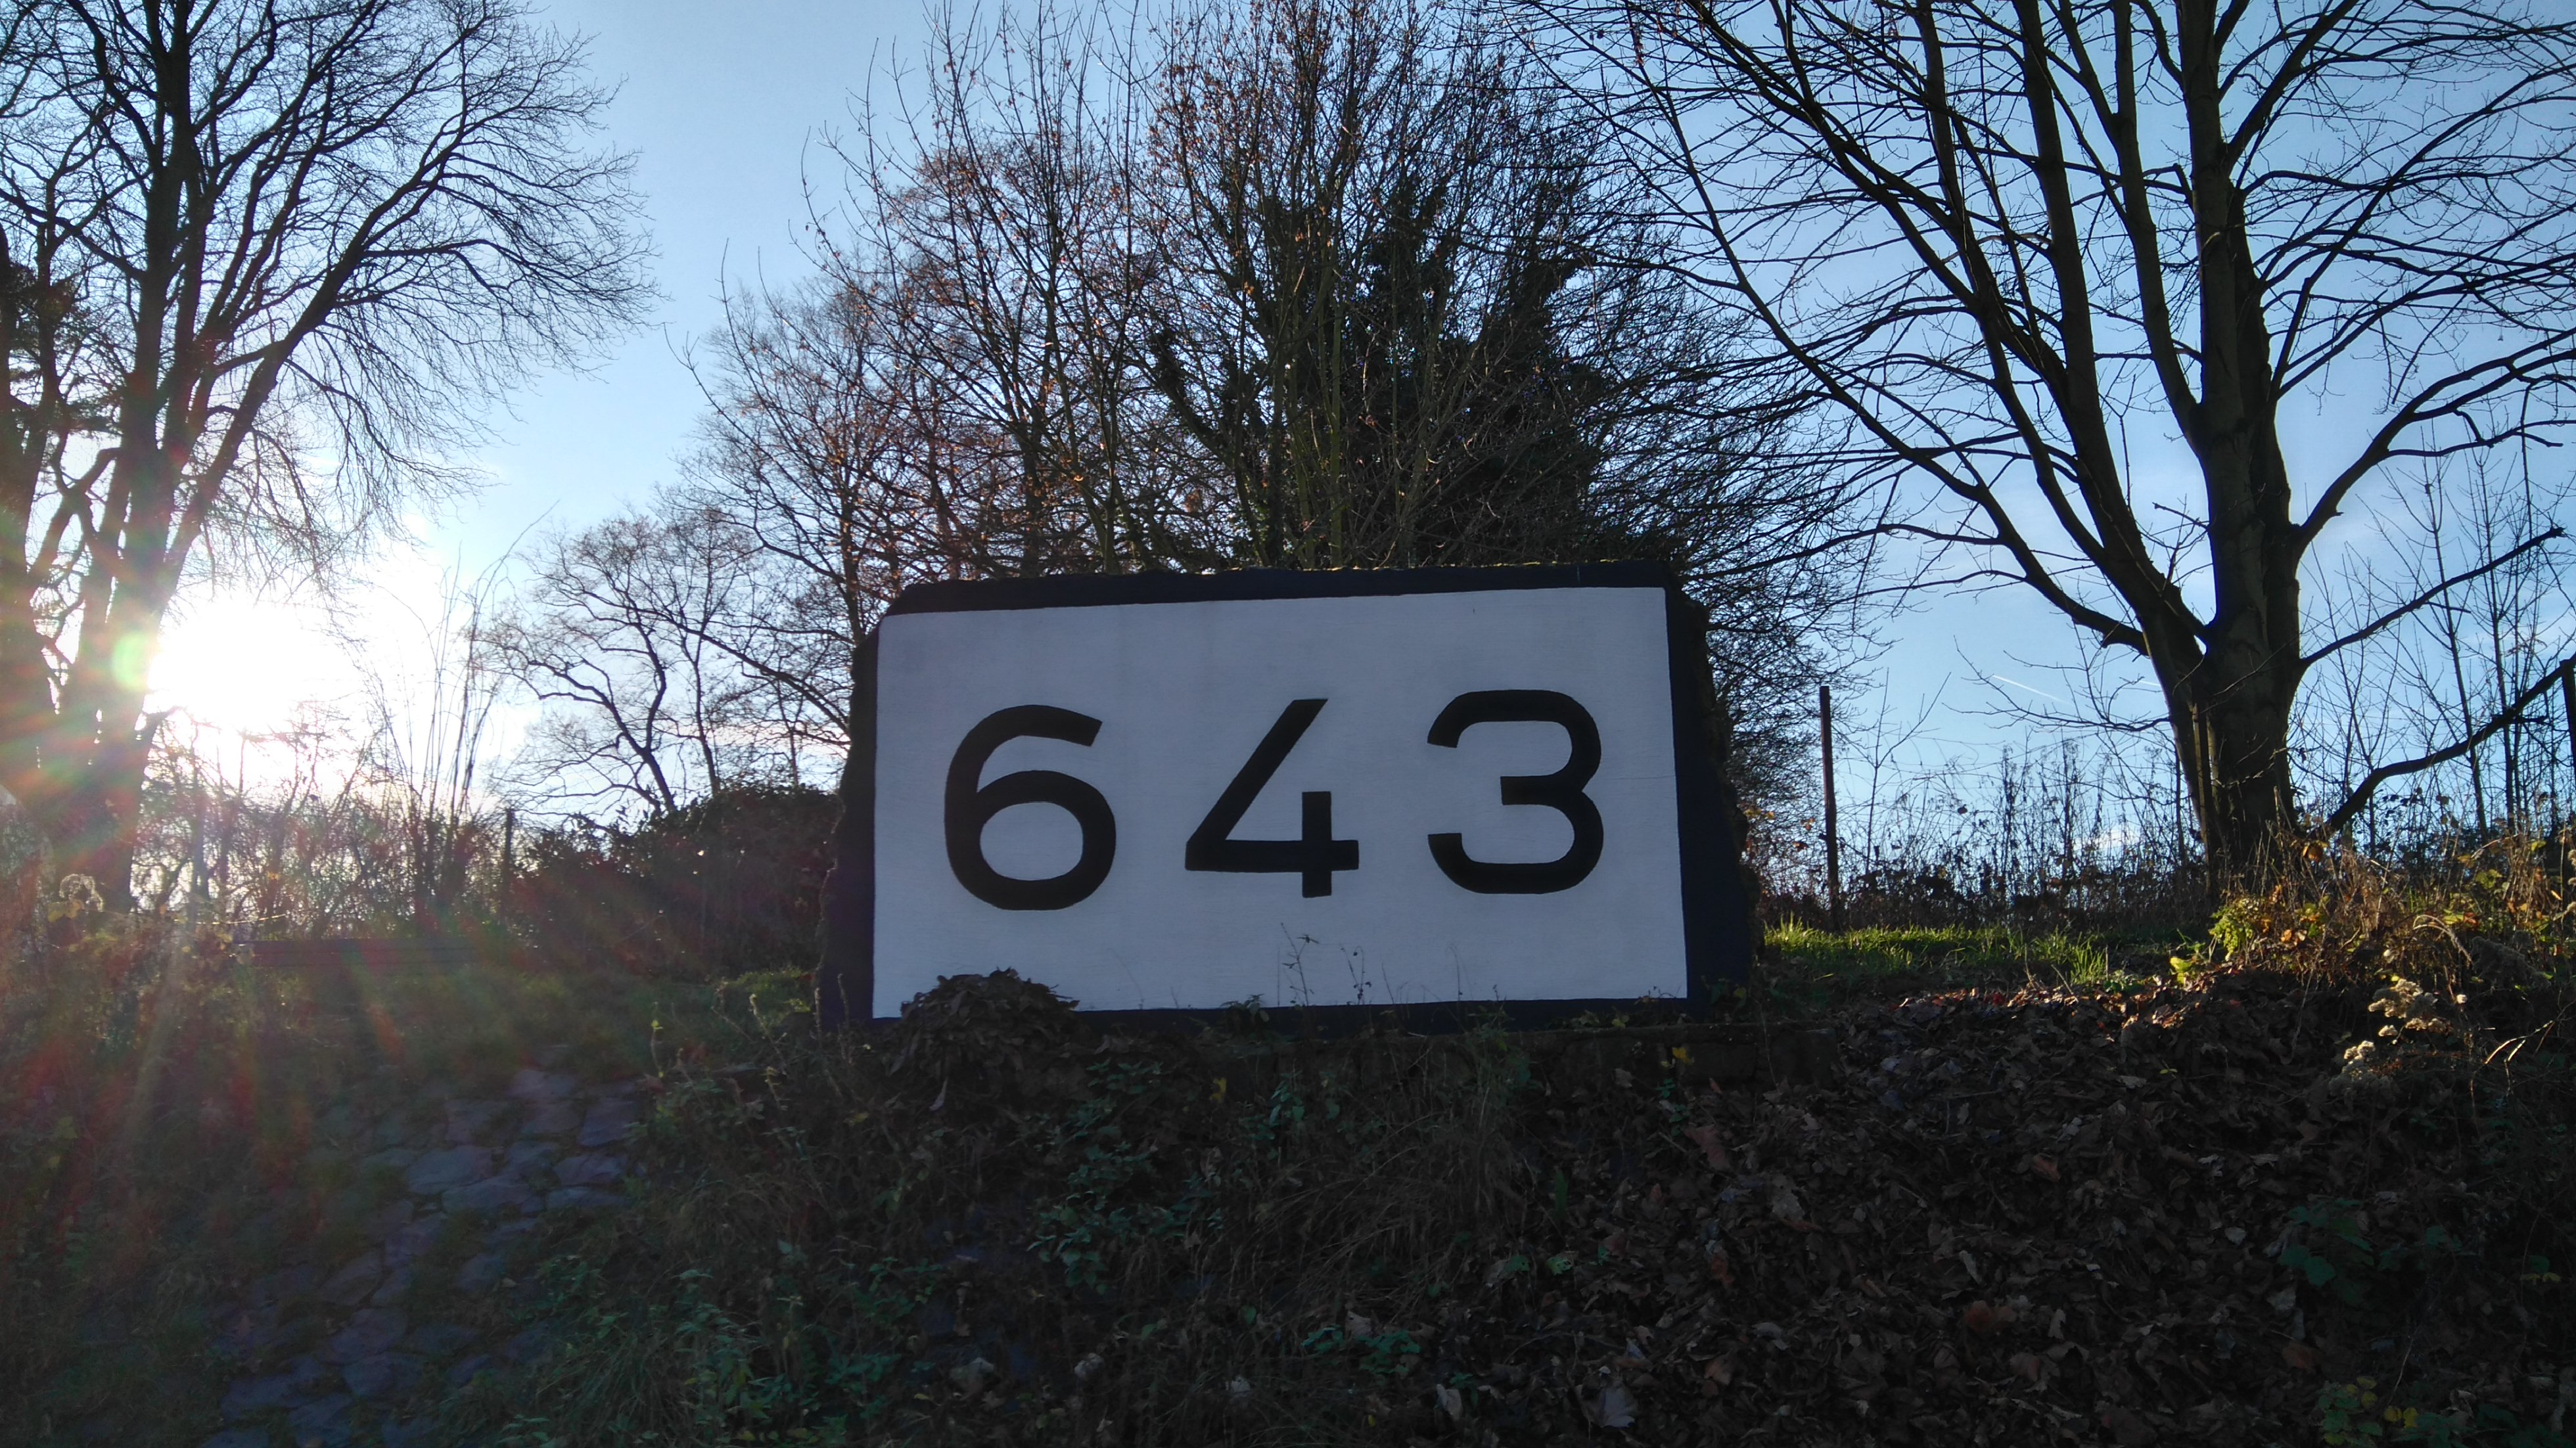 rheinkilometer-643